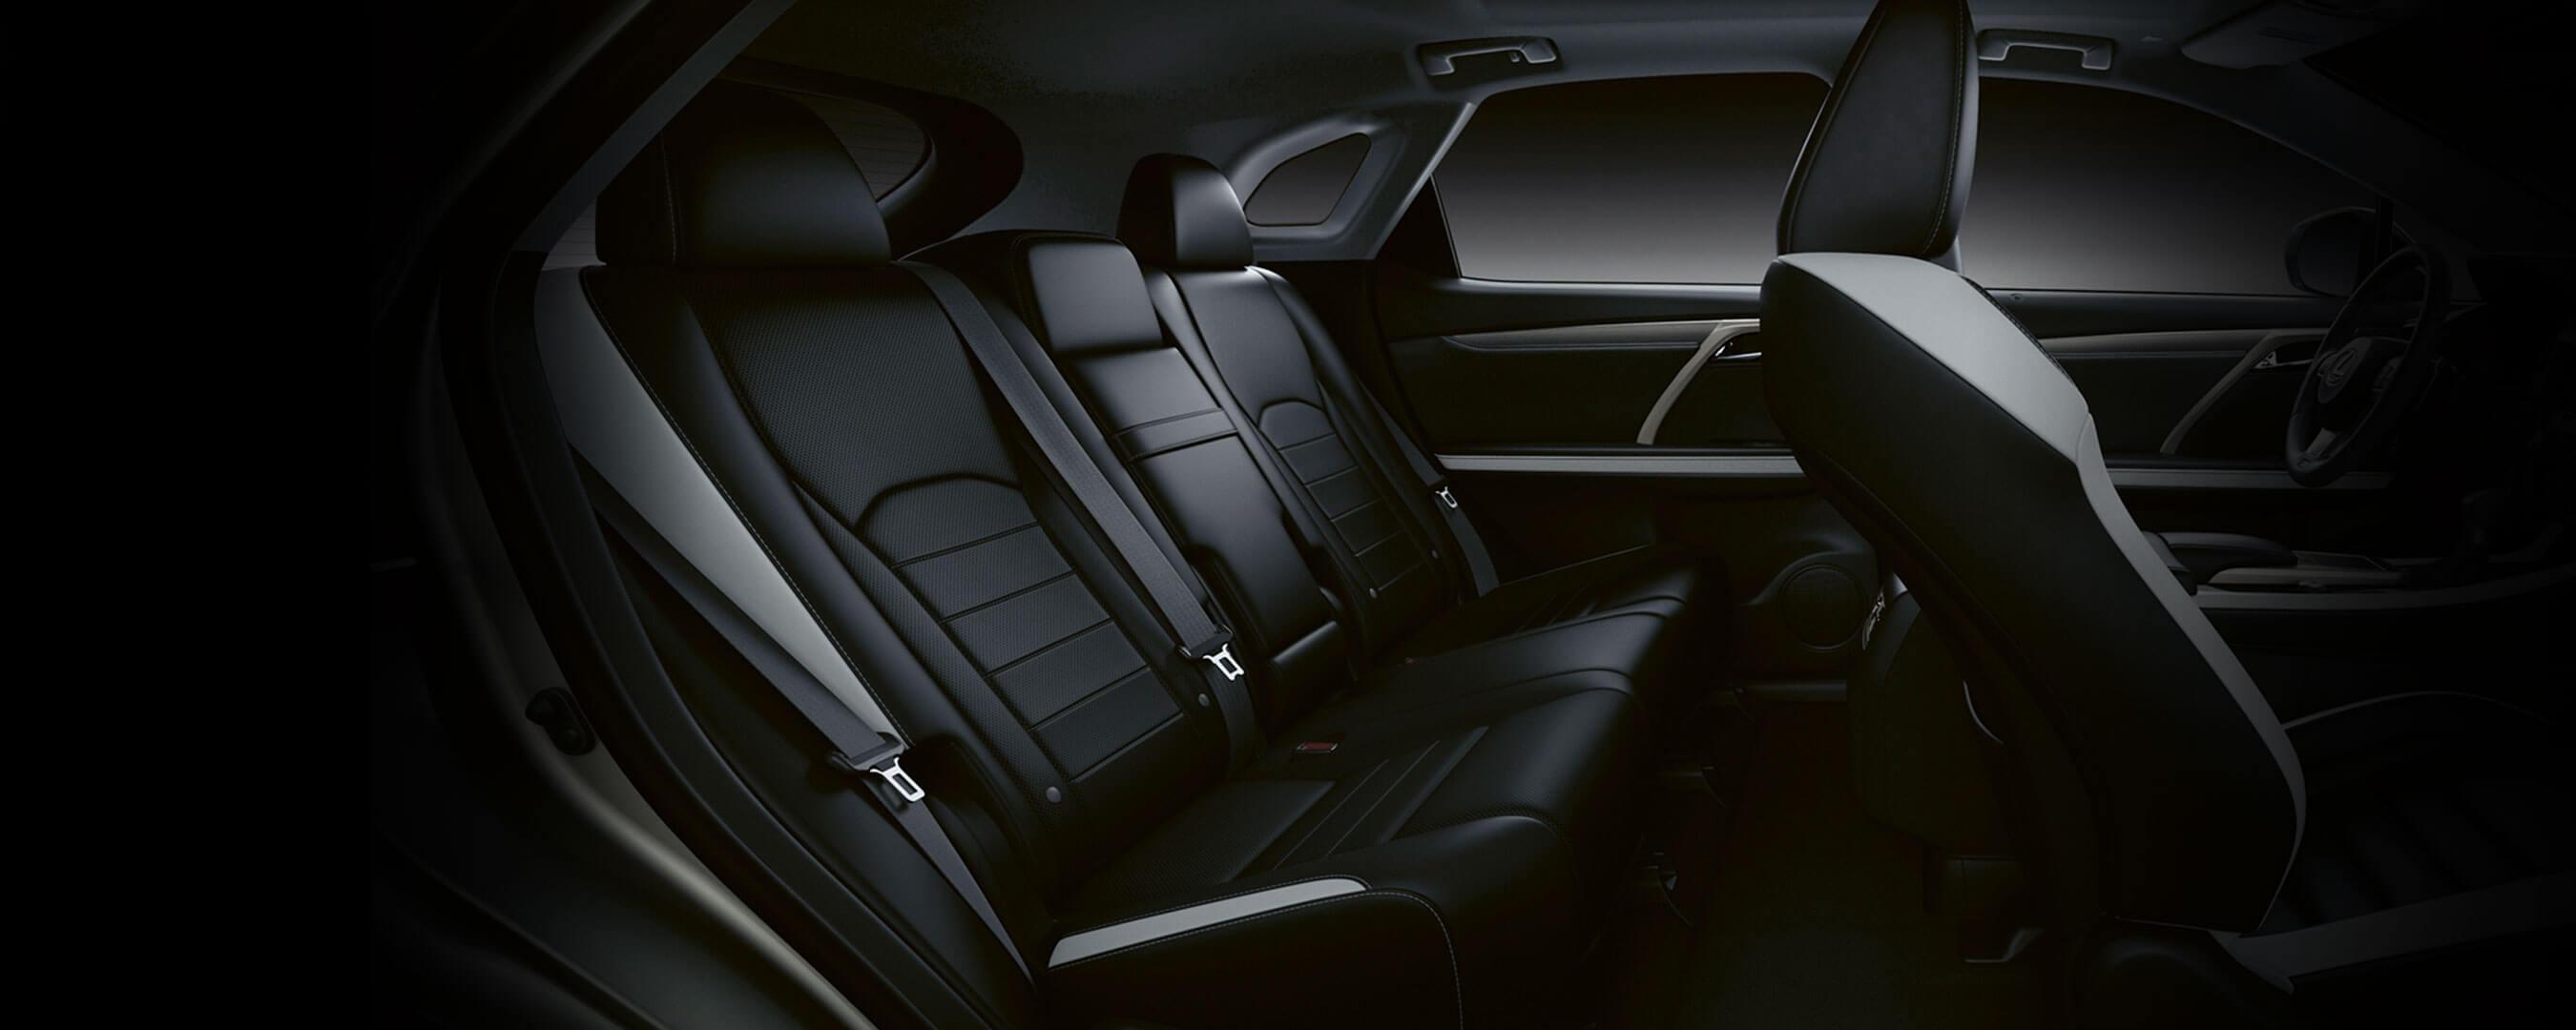 2019 lexus rx experience interior back